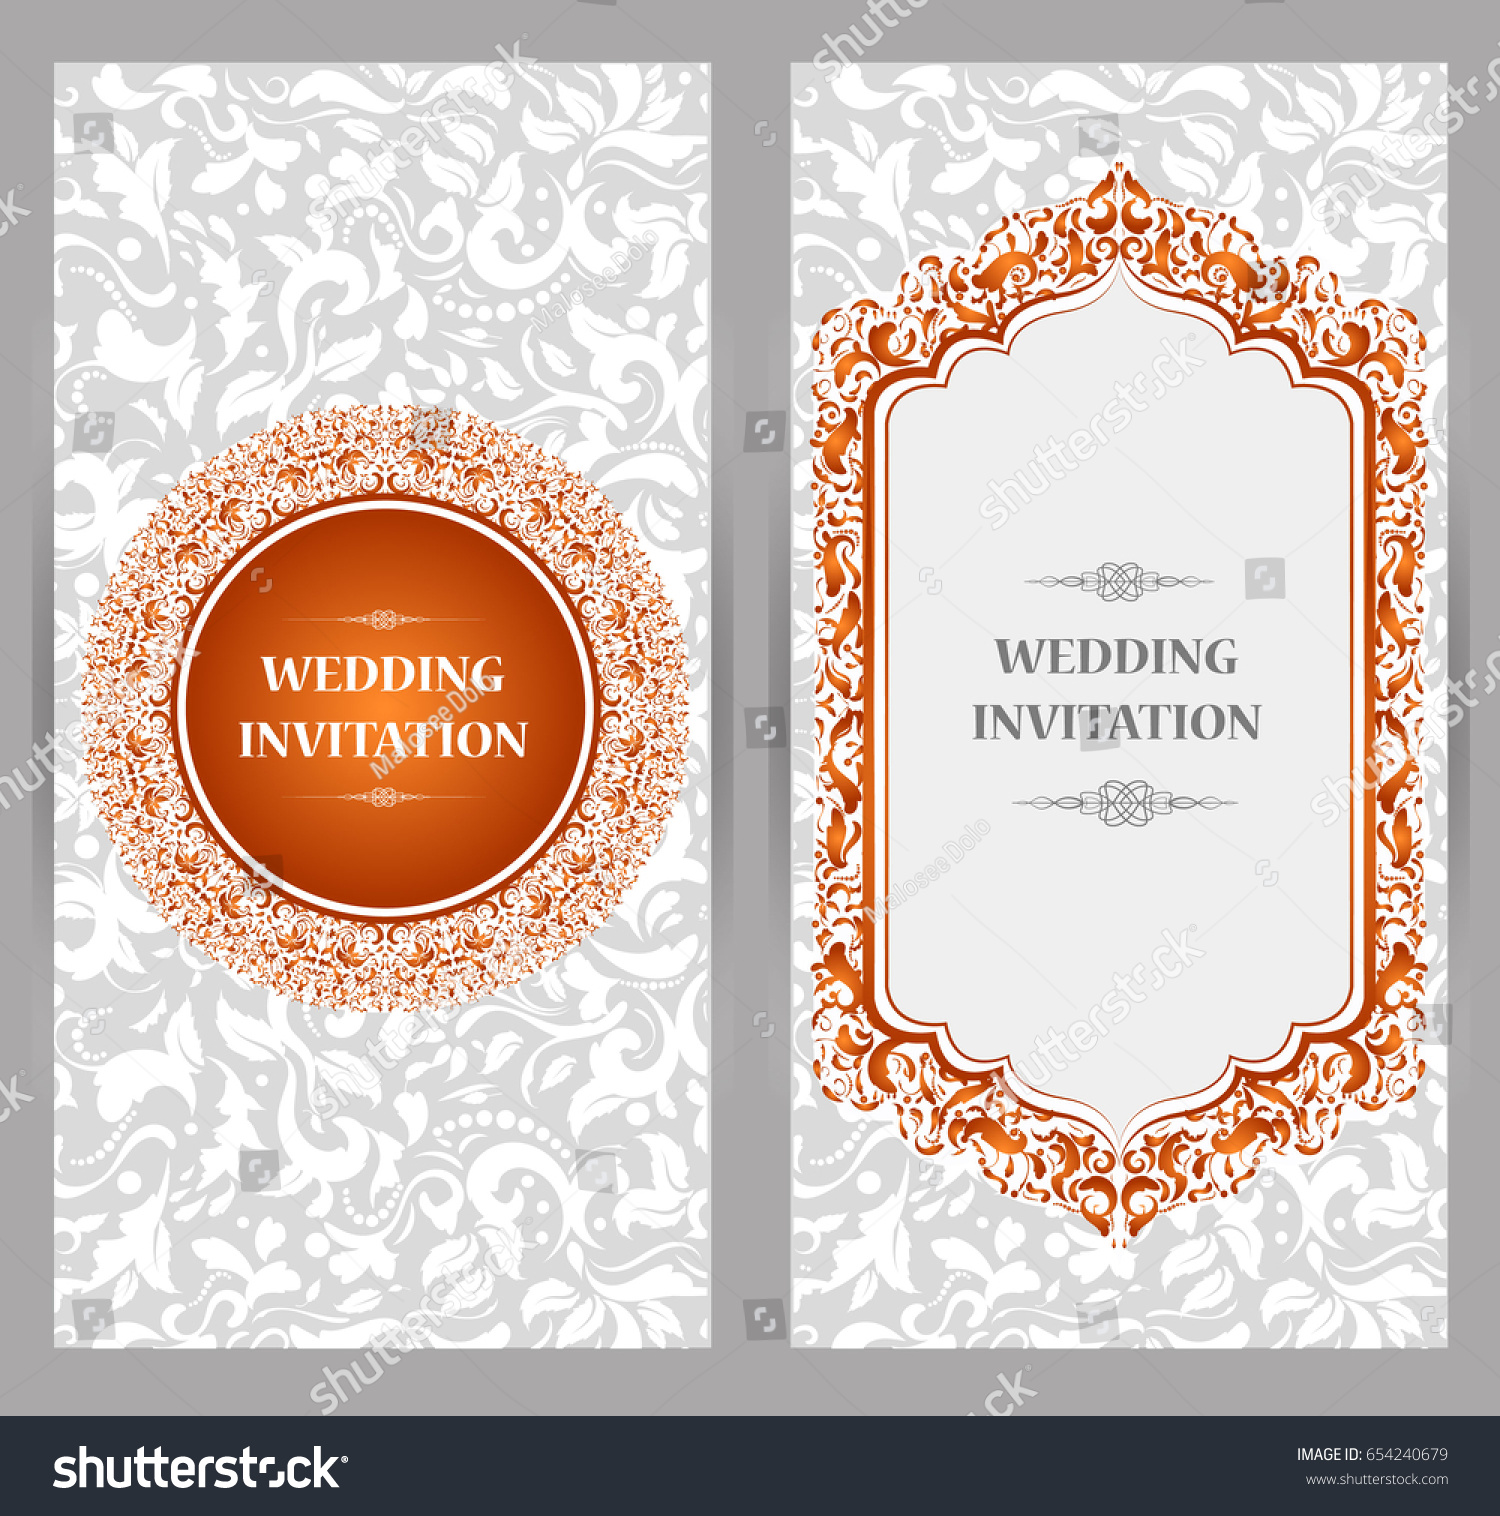 Wedding Invitation Card Abstract Background Islam Stock Photo (Photo ...